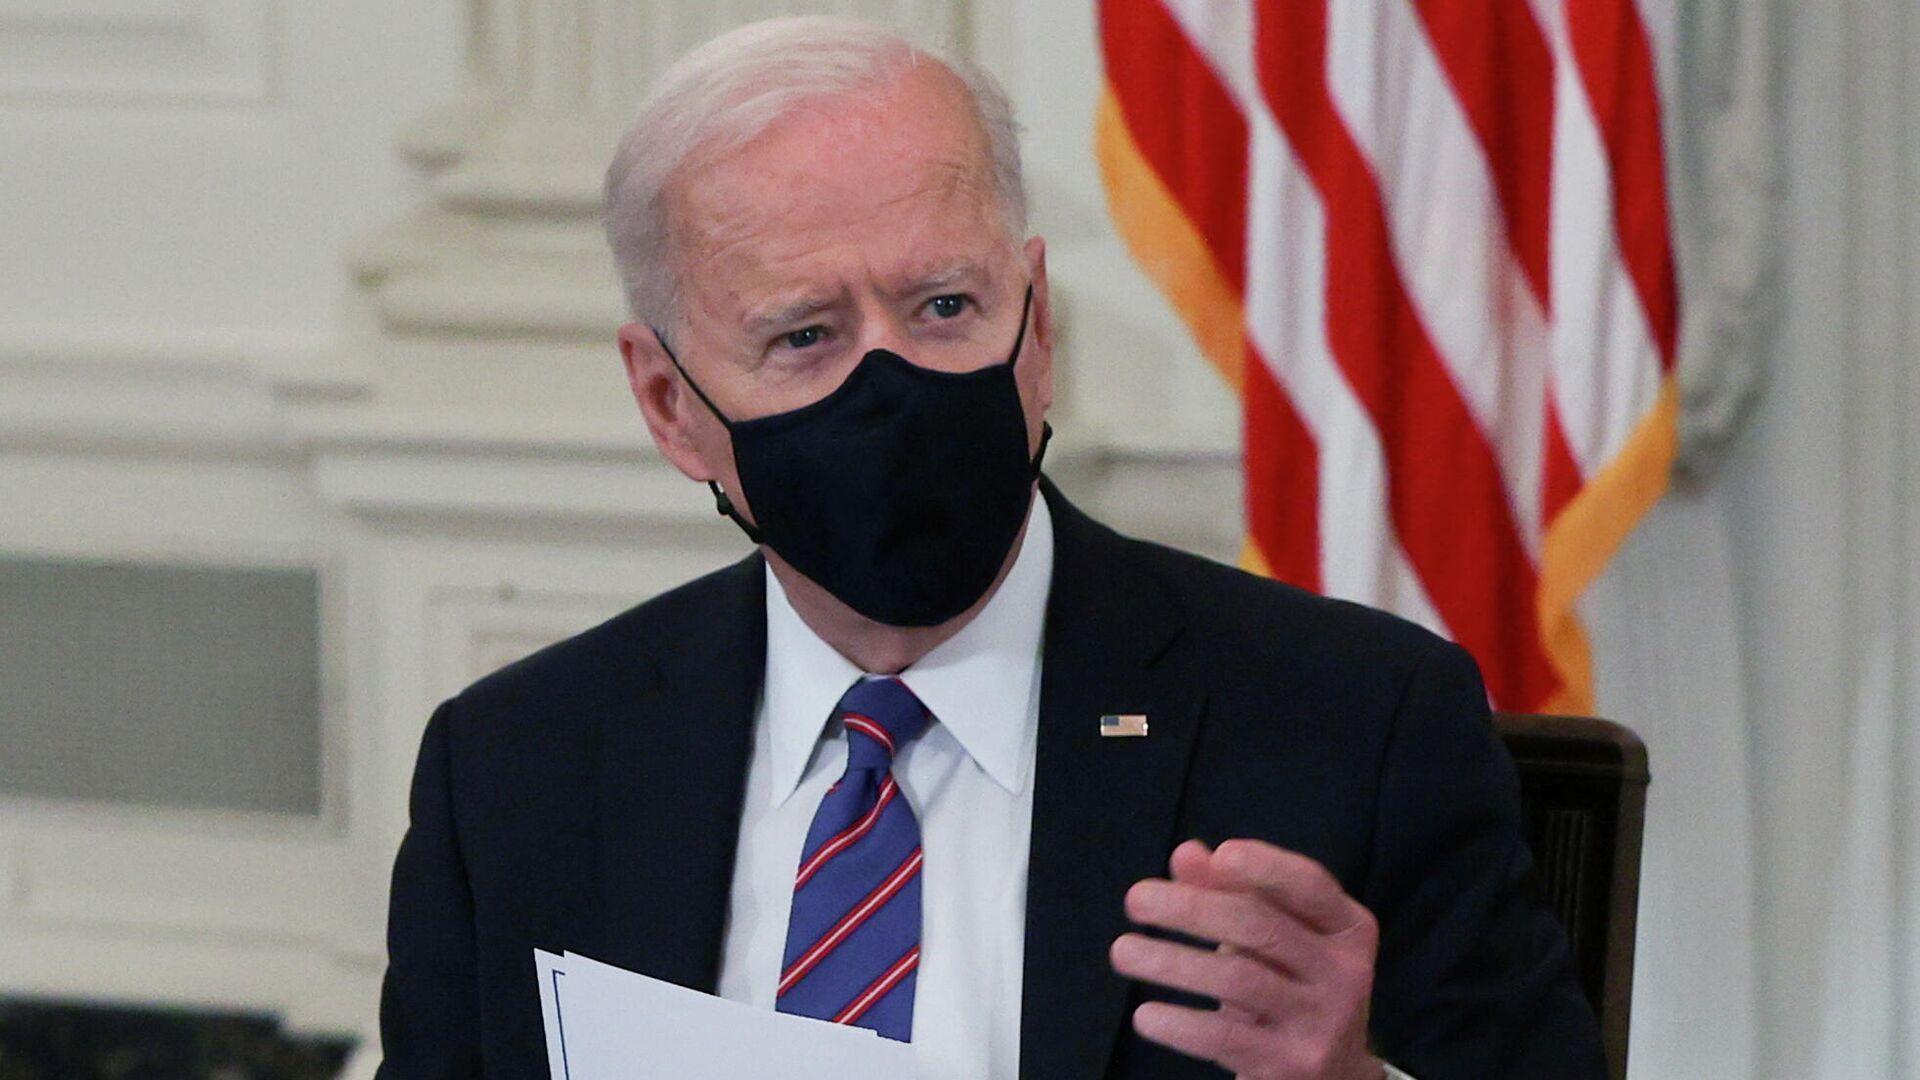 Joe Biden, presidente de EEUU - Sputnik Mundo, 1920, 13.04.2021